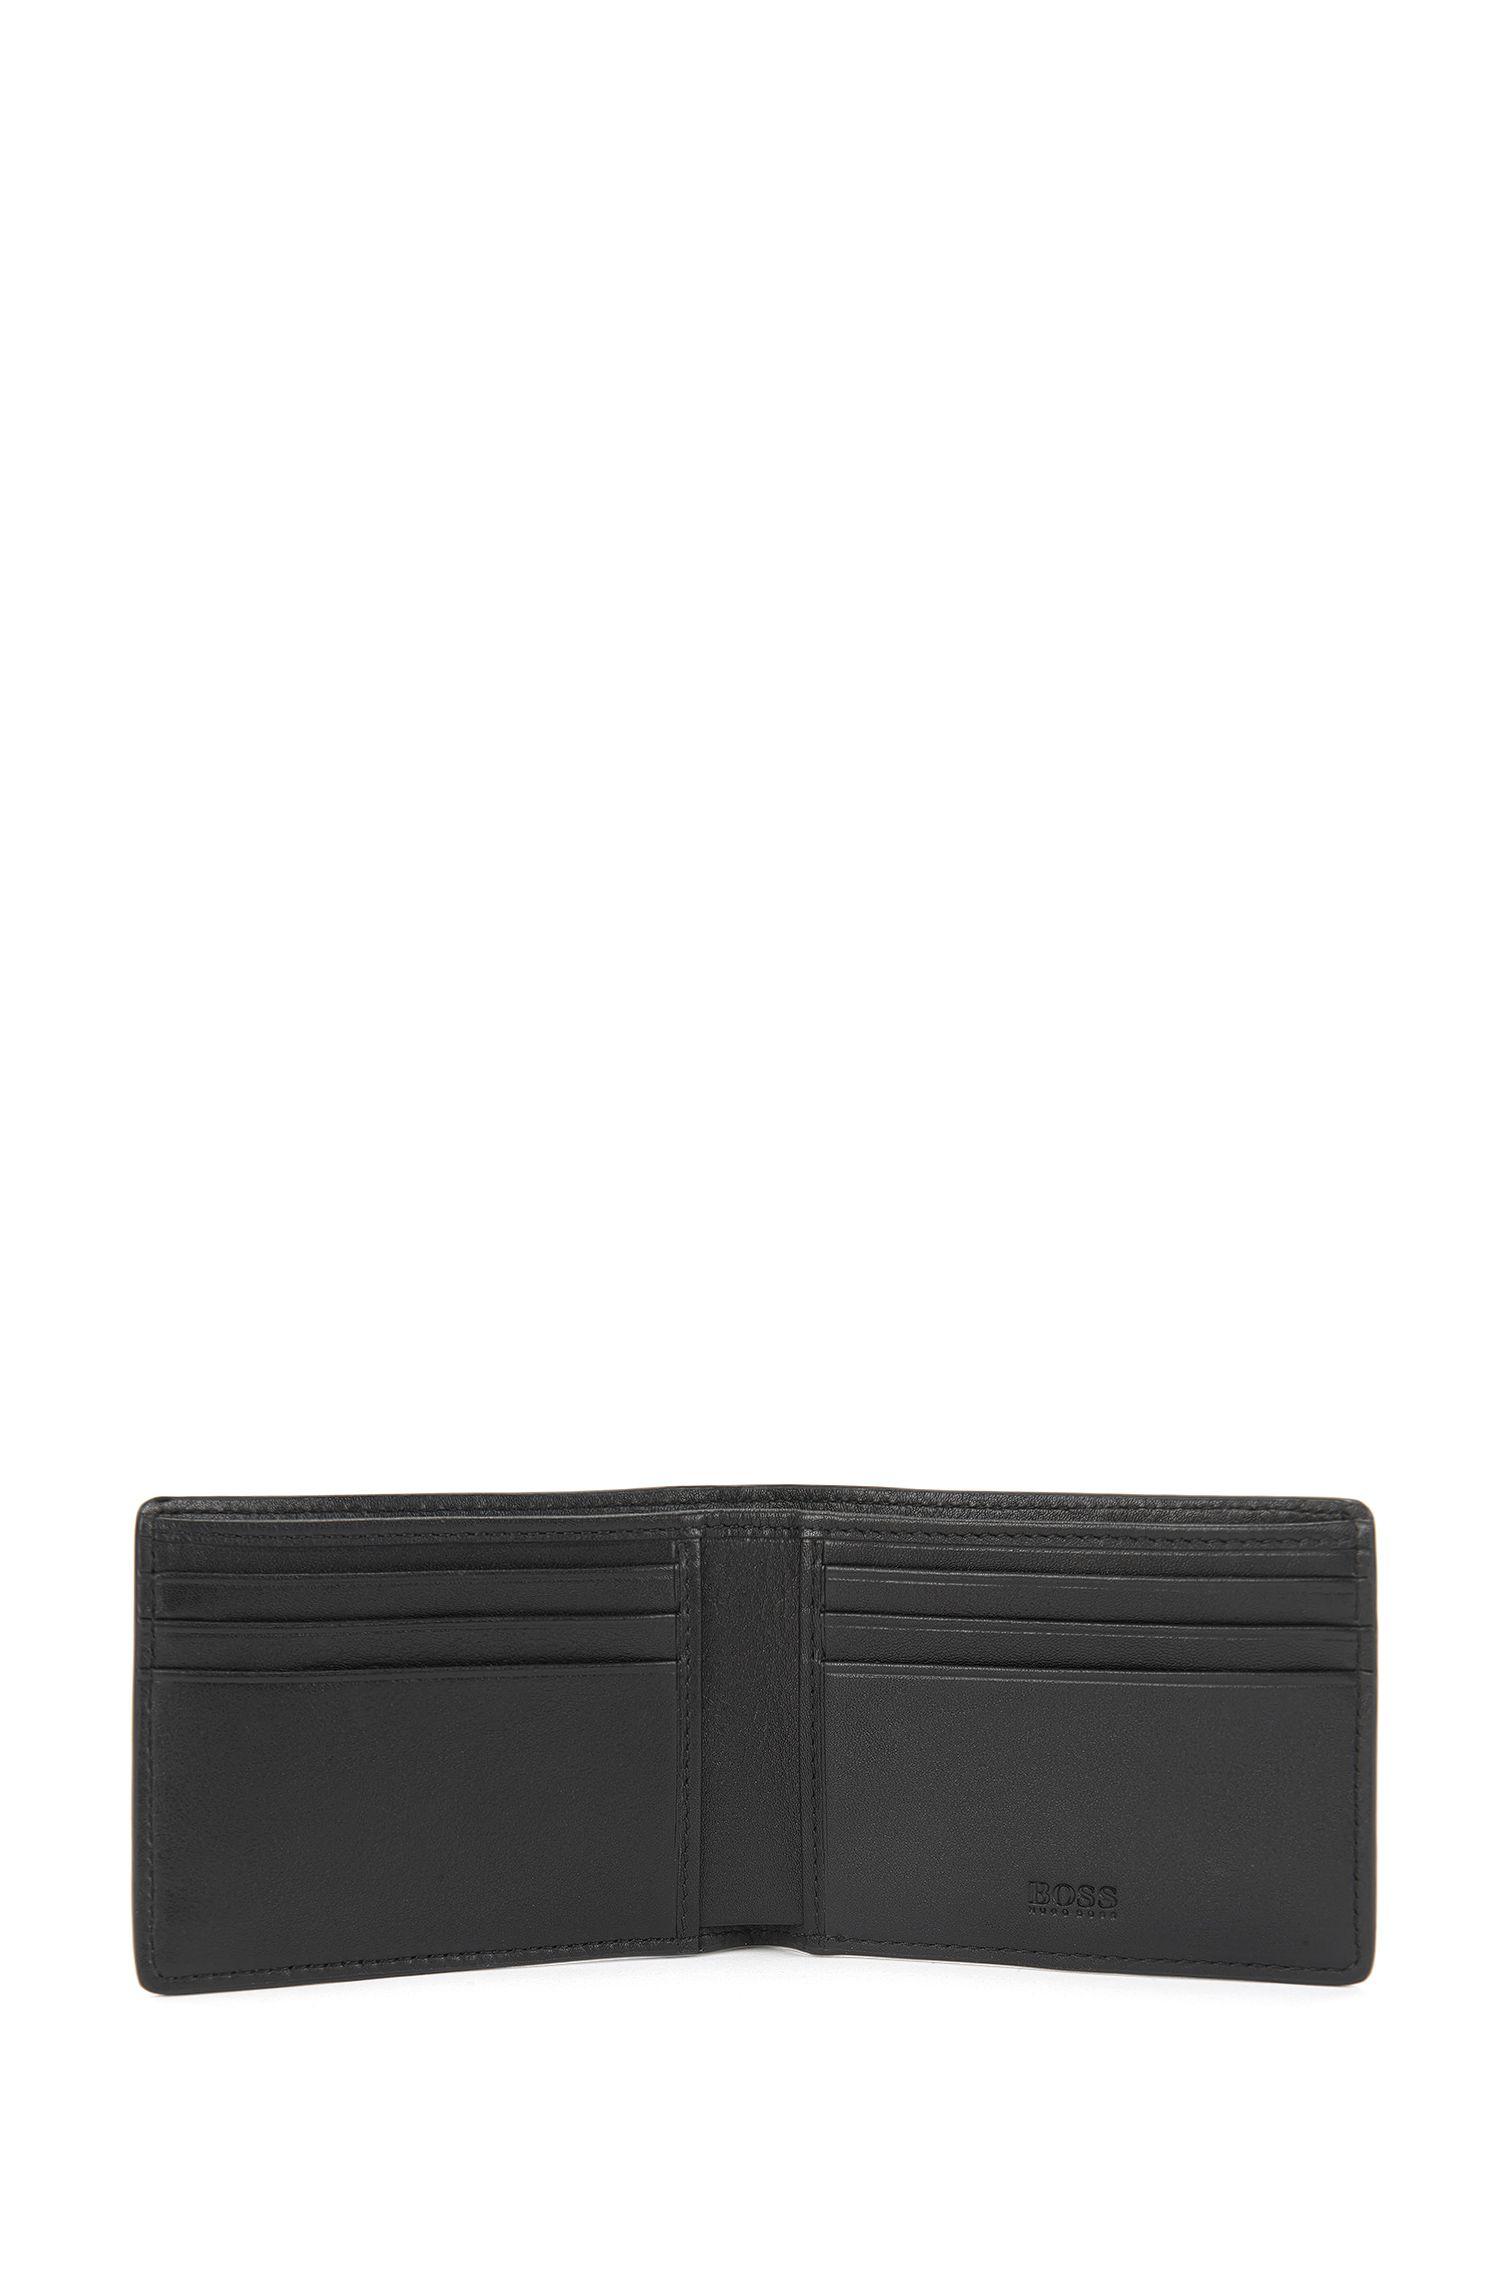 Leather Billfold Wallet | Focus 6 cc